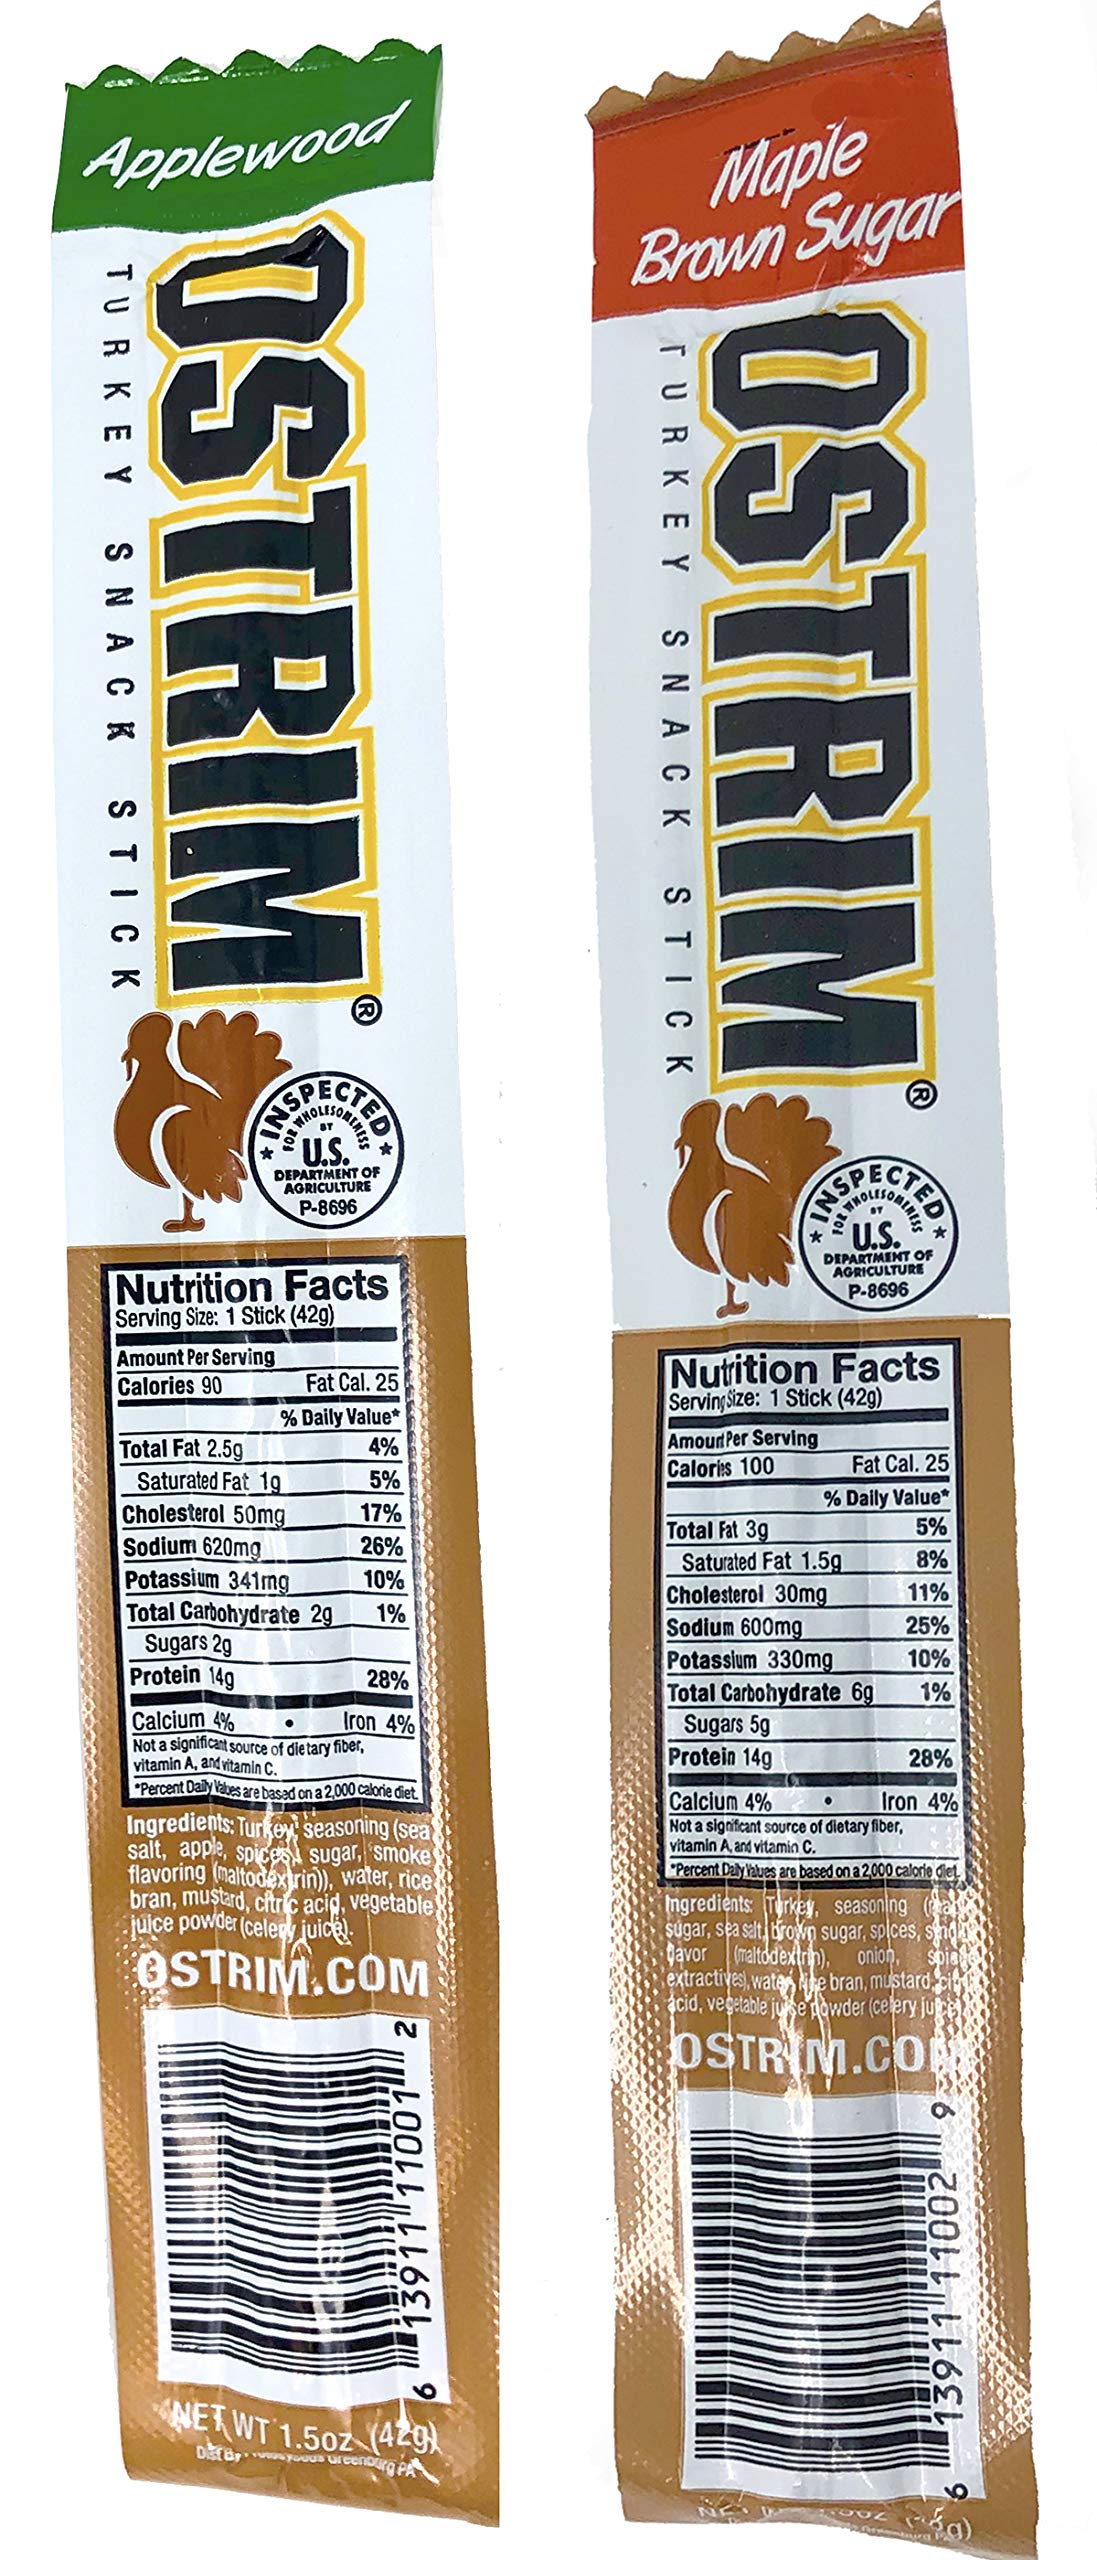 Ostrim Turkey Meat Snack Sticks - Maple Brown Sugar & Applewood - Pack of 20 (10 of each flavor)   by Ostrim (Image #3)